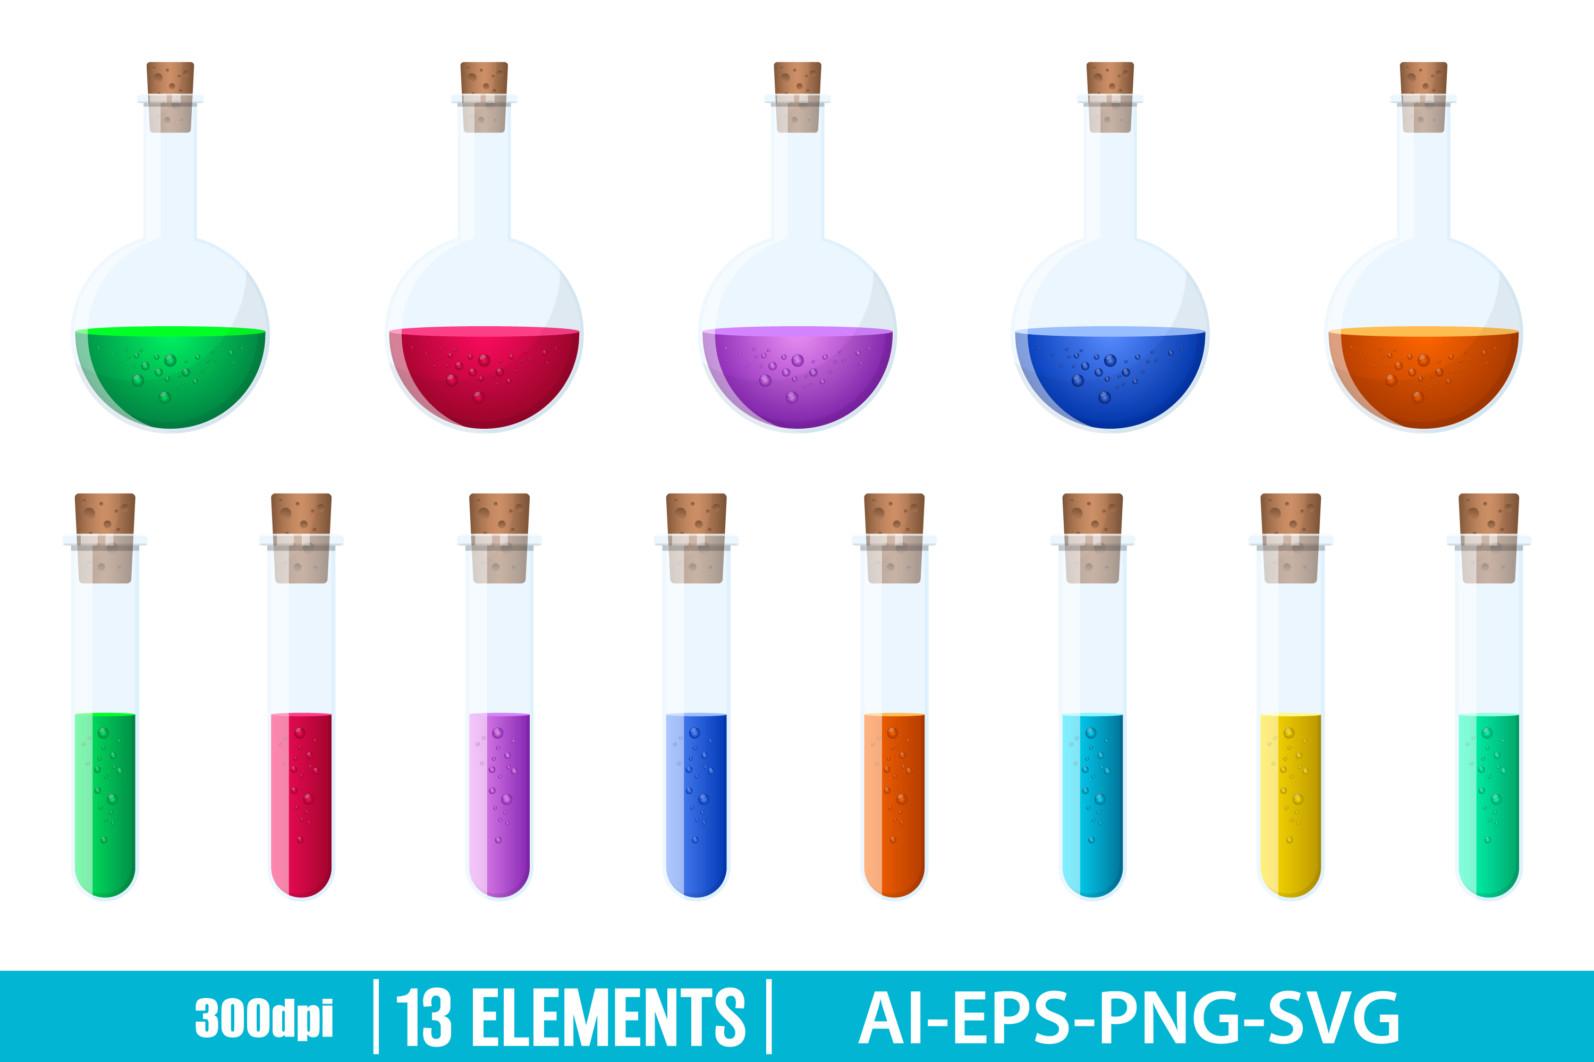 Laboratory chemical flasks clipart vector design illustration. Flasks set. Vector Clipart Print - LABORATORY FLASKS 1 scaled -